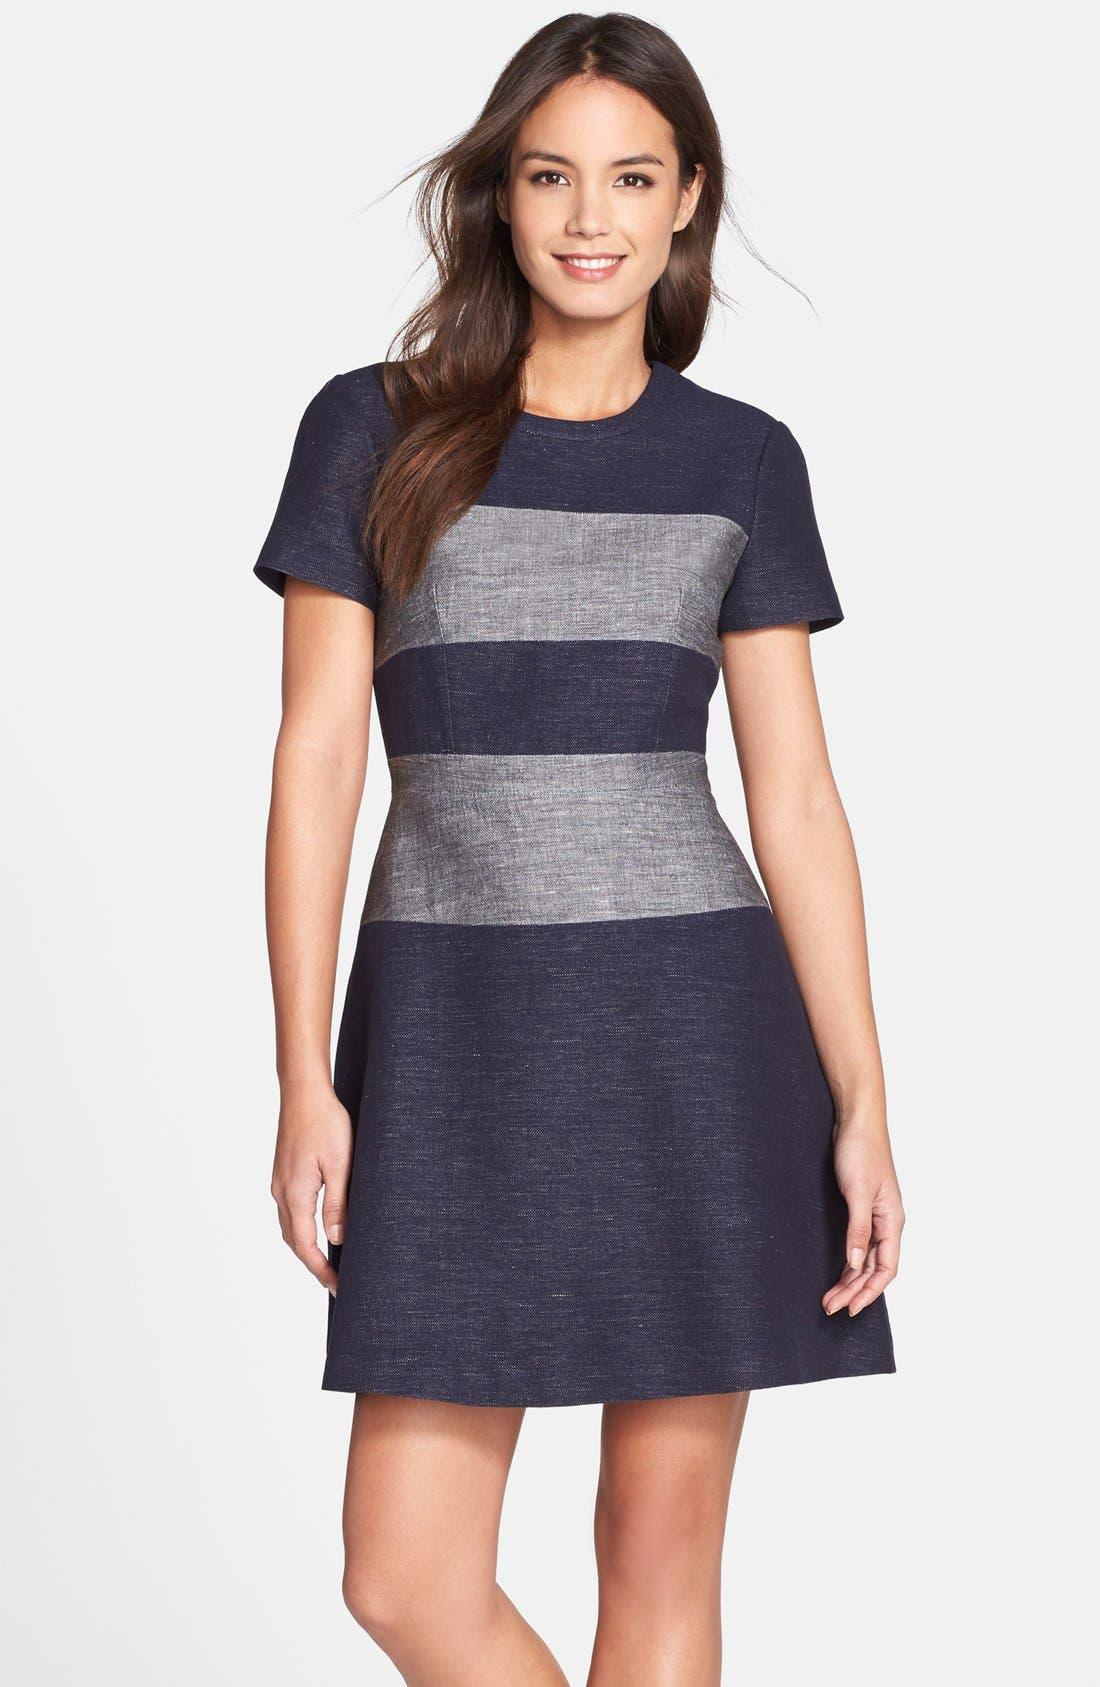 Alternate Image 1 Selected - BCBGMAXAZRIA 'Romee' Stripe Fit & Flare Dress